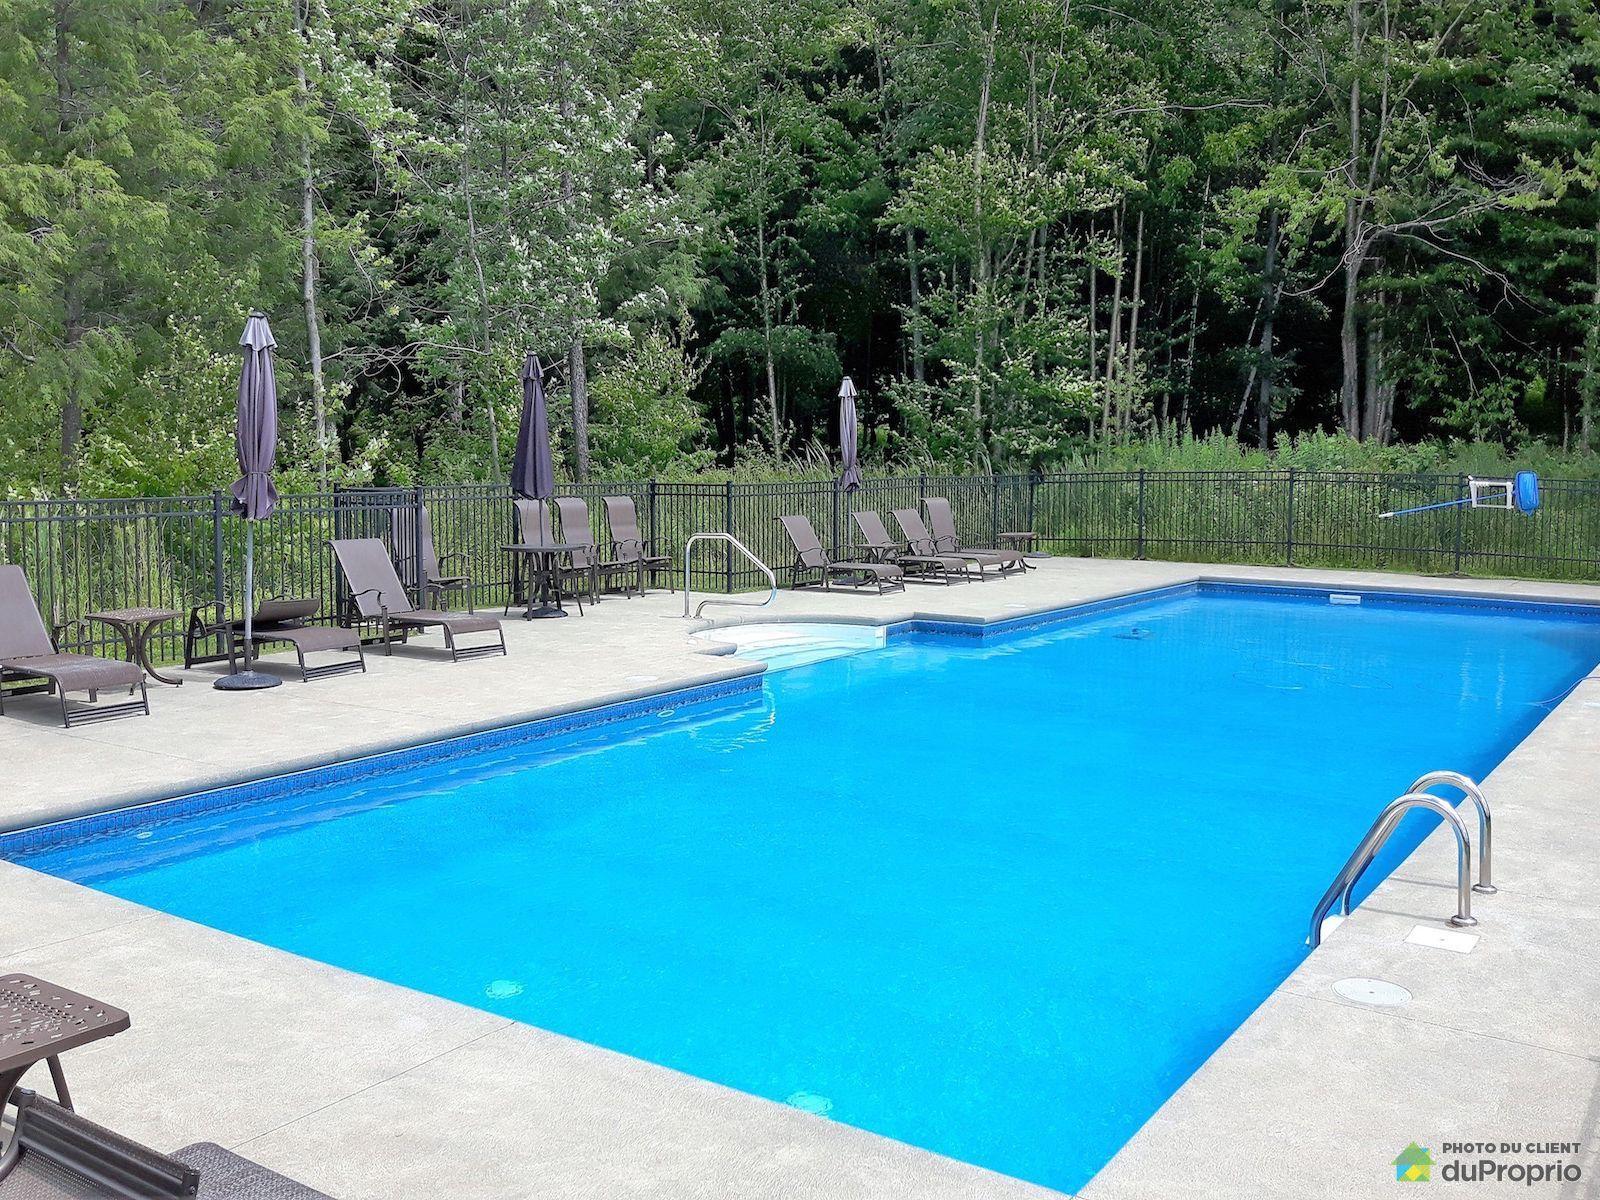 Maison vendre lac brome 43 rue aberdeen immobilier for Brome piscine prix